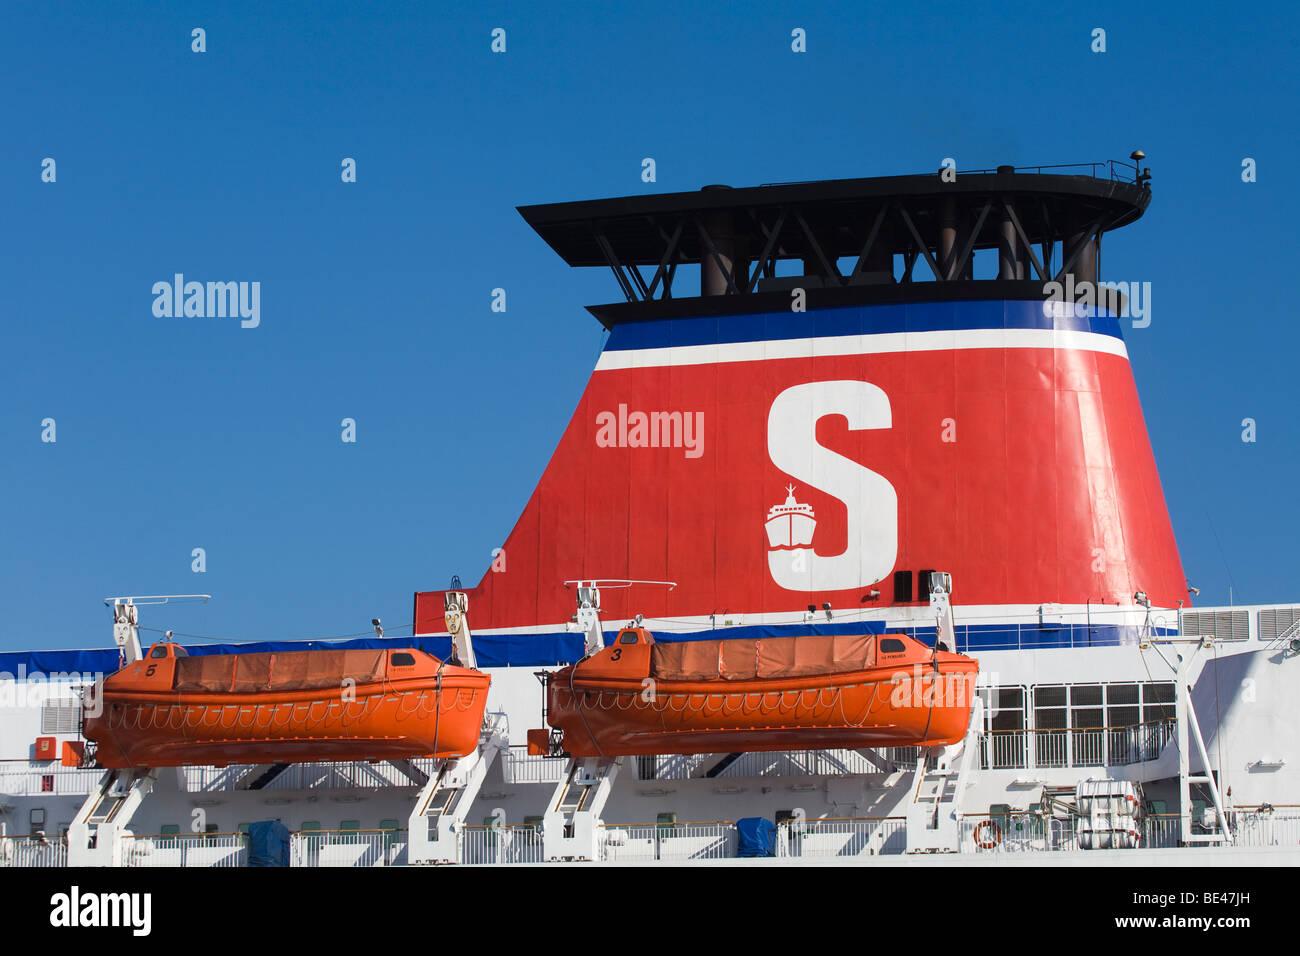 Stena-line Ferry Funnel - Stock Image